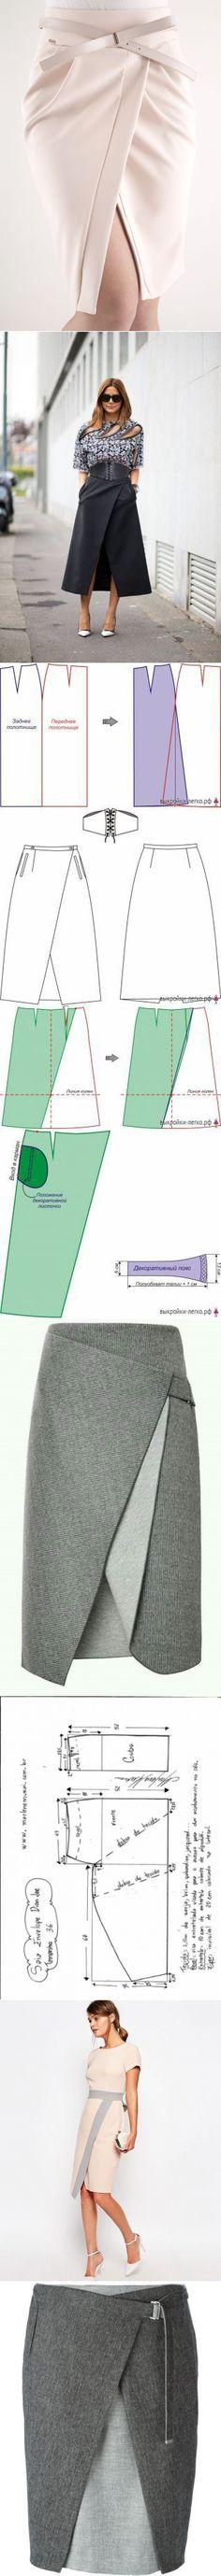 Идеи для шитья